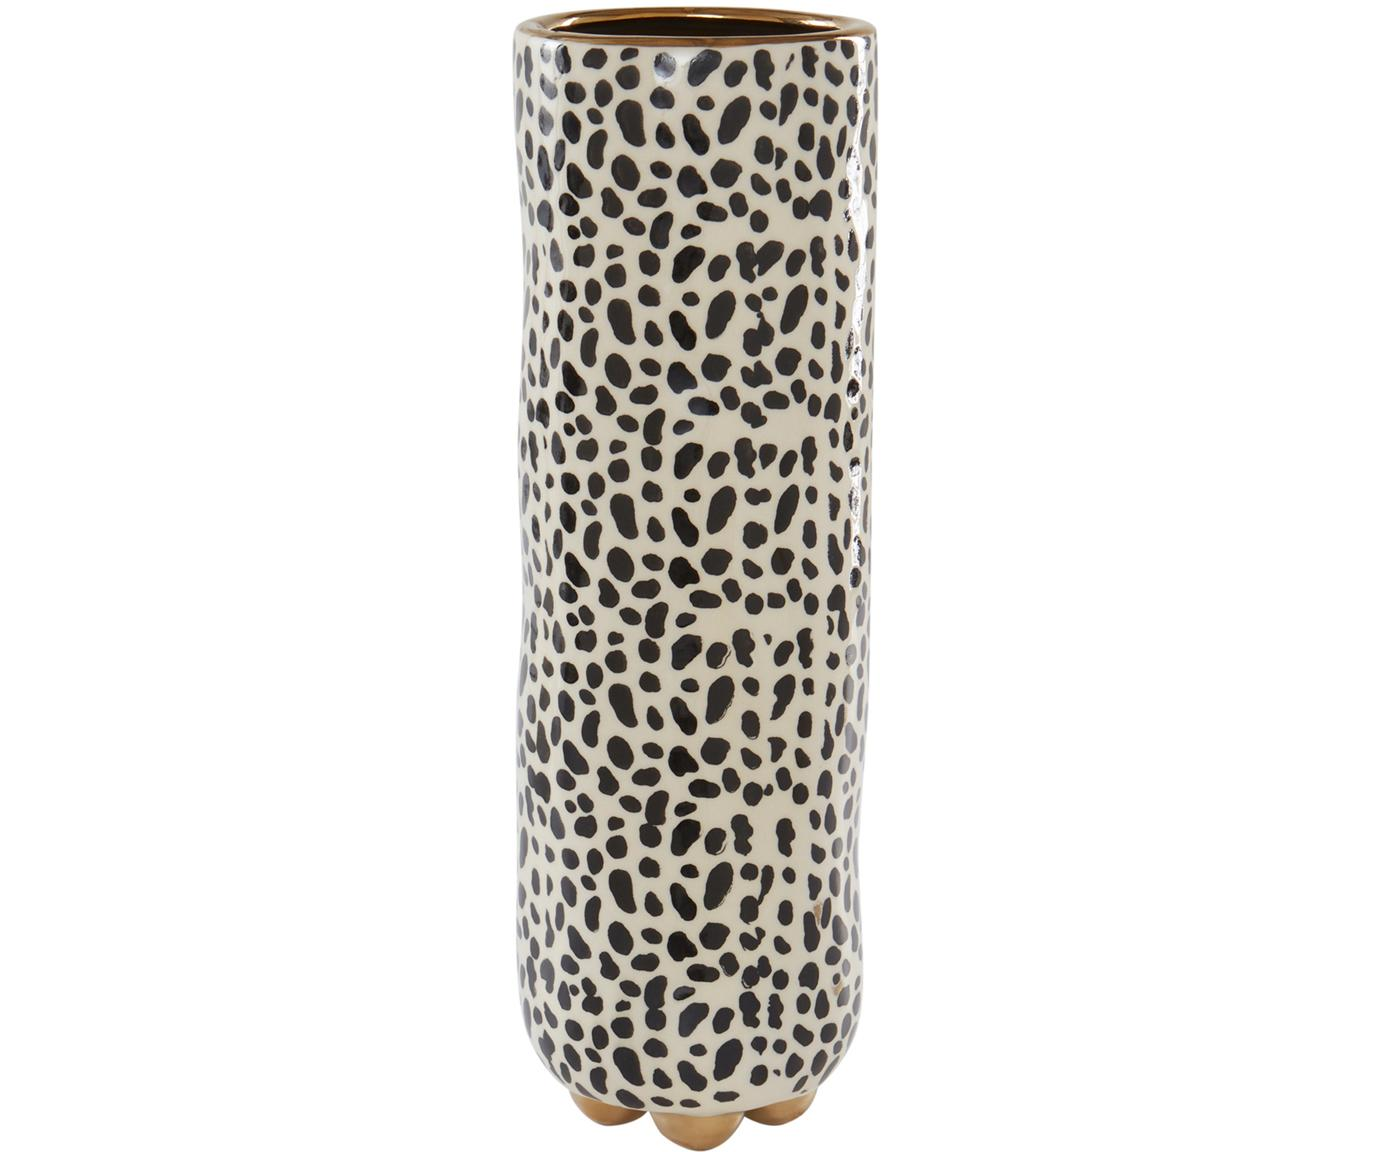 Grote handbeschilderde vaas Fifi van keramiek, Geglazuurd keramiek, Beige, zwart, goudkleurig, Ø 12 x H 34 cm